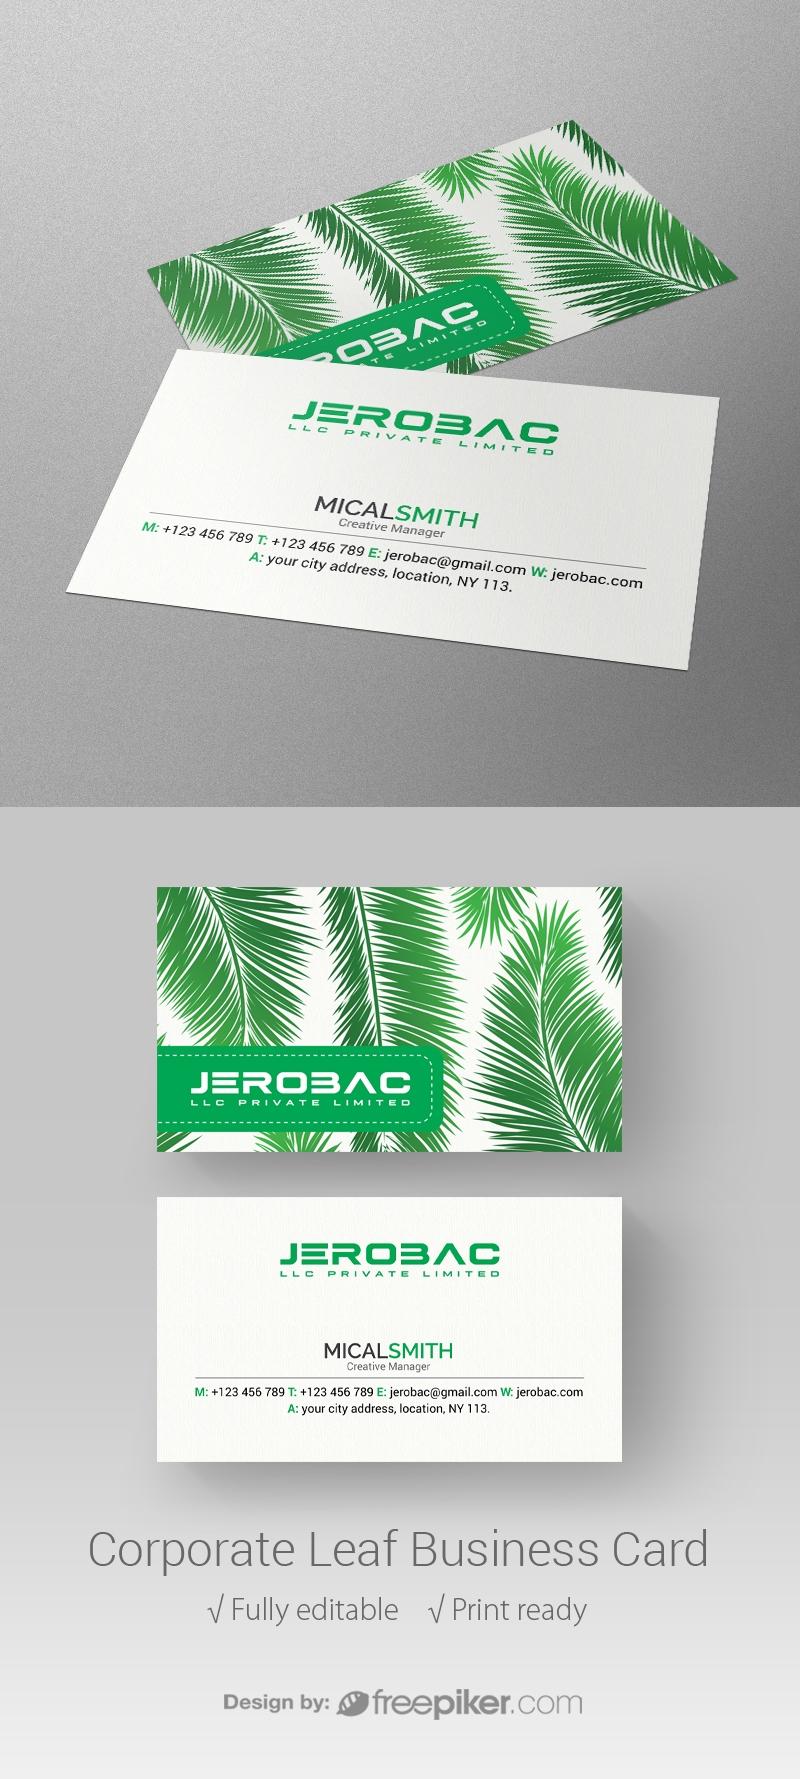 Freepiker   corporate leaf business card